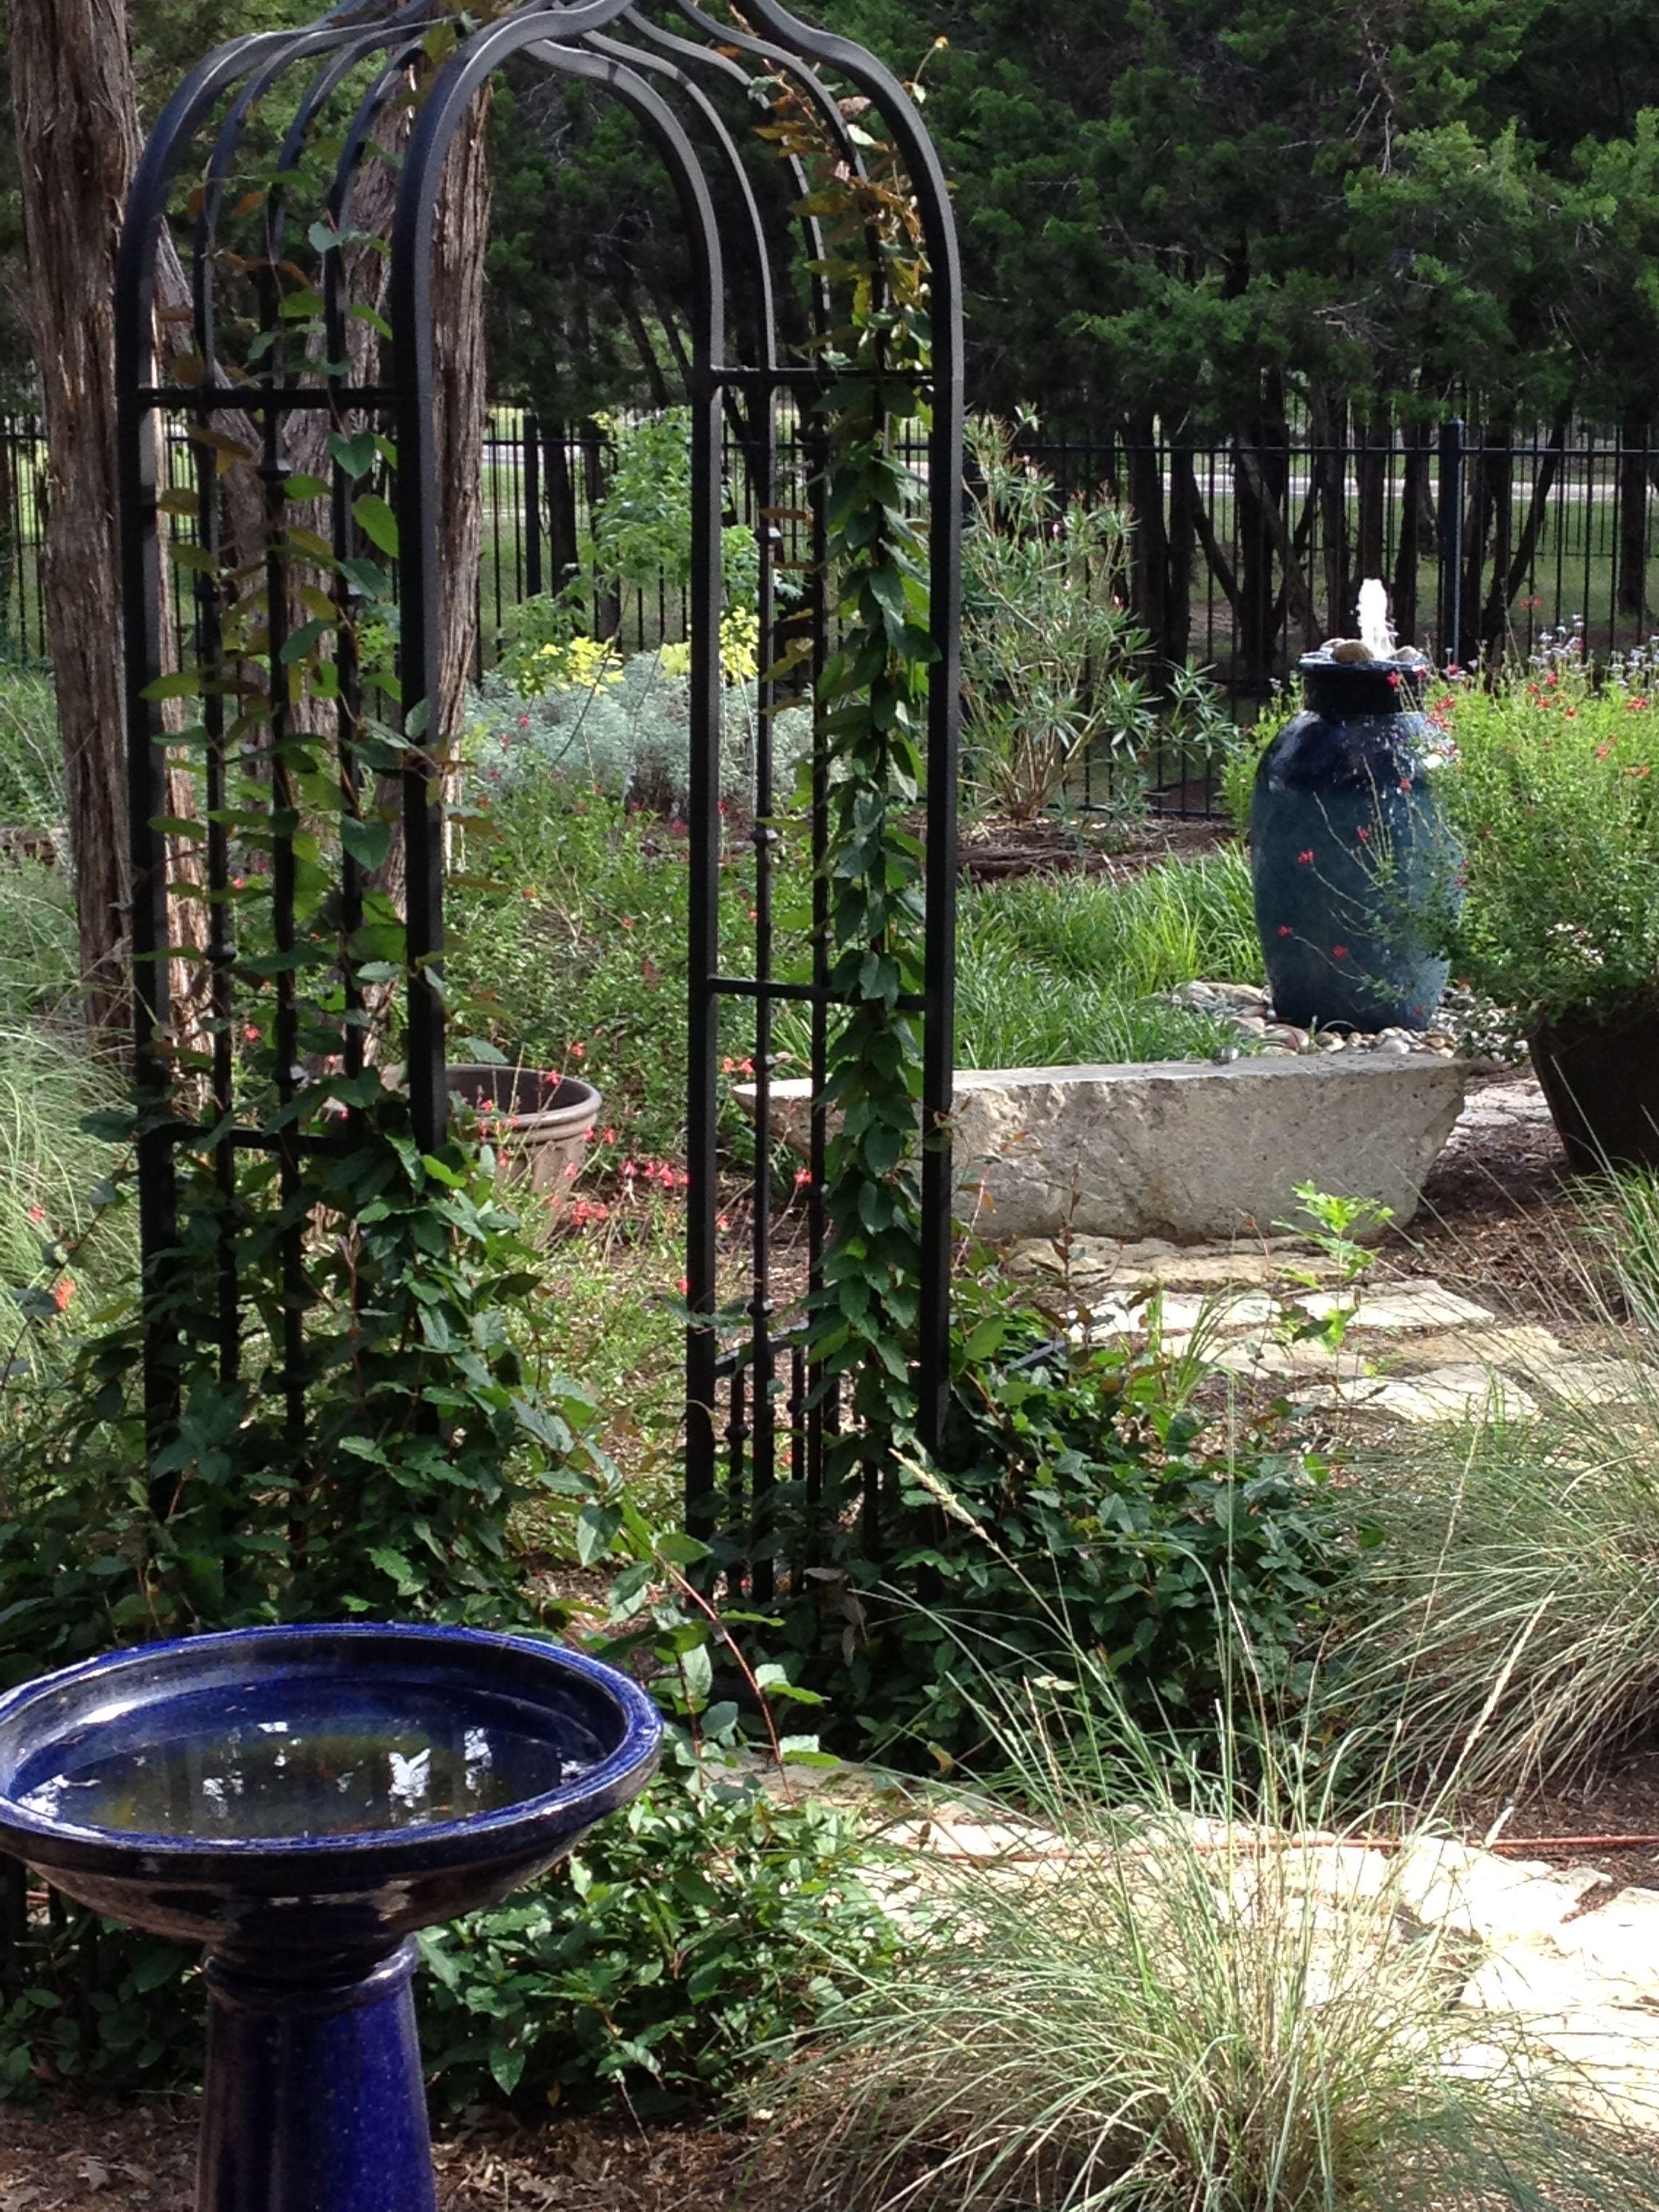 Backyard enjoyment in Austin, TX ..yard by hubby ...